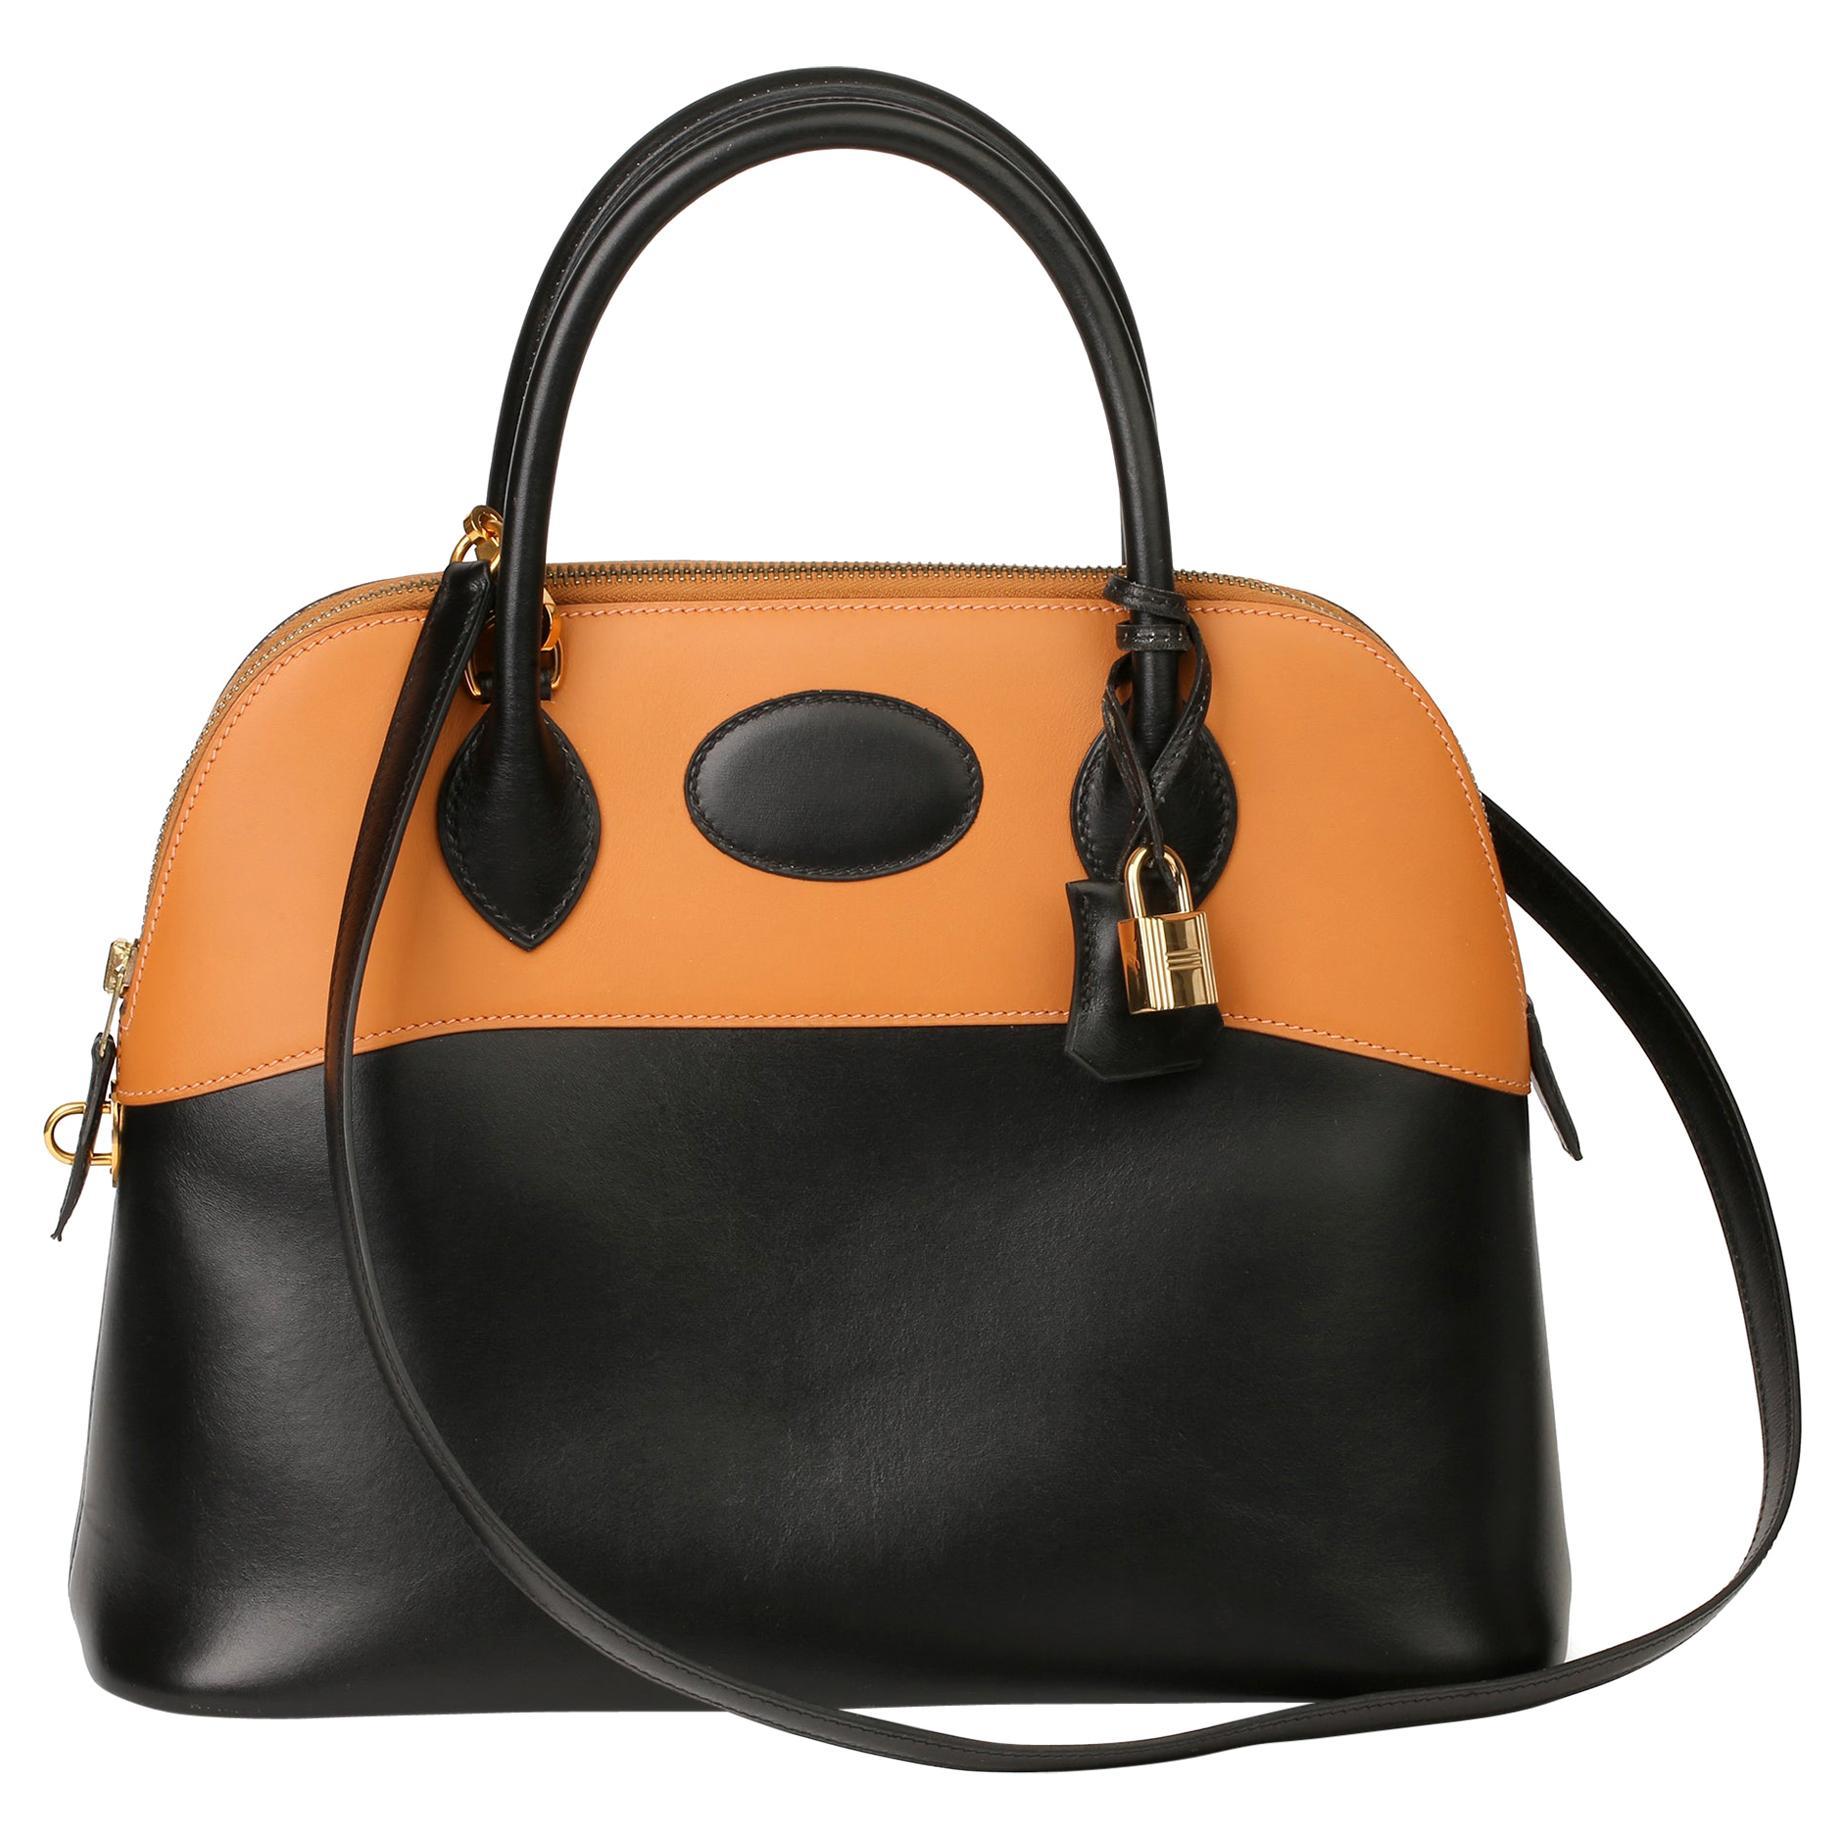 Hermès Black Box Calf Leather & Natural Chamonix Leather Bolide 31cm